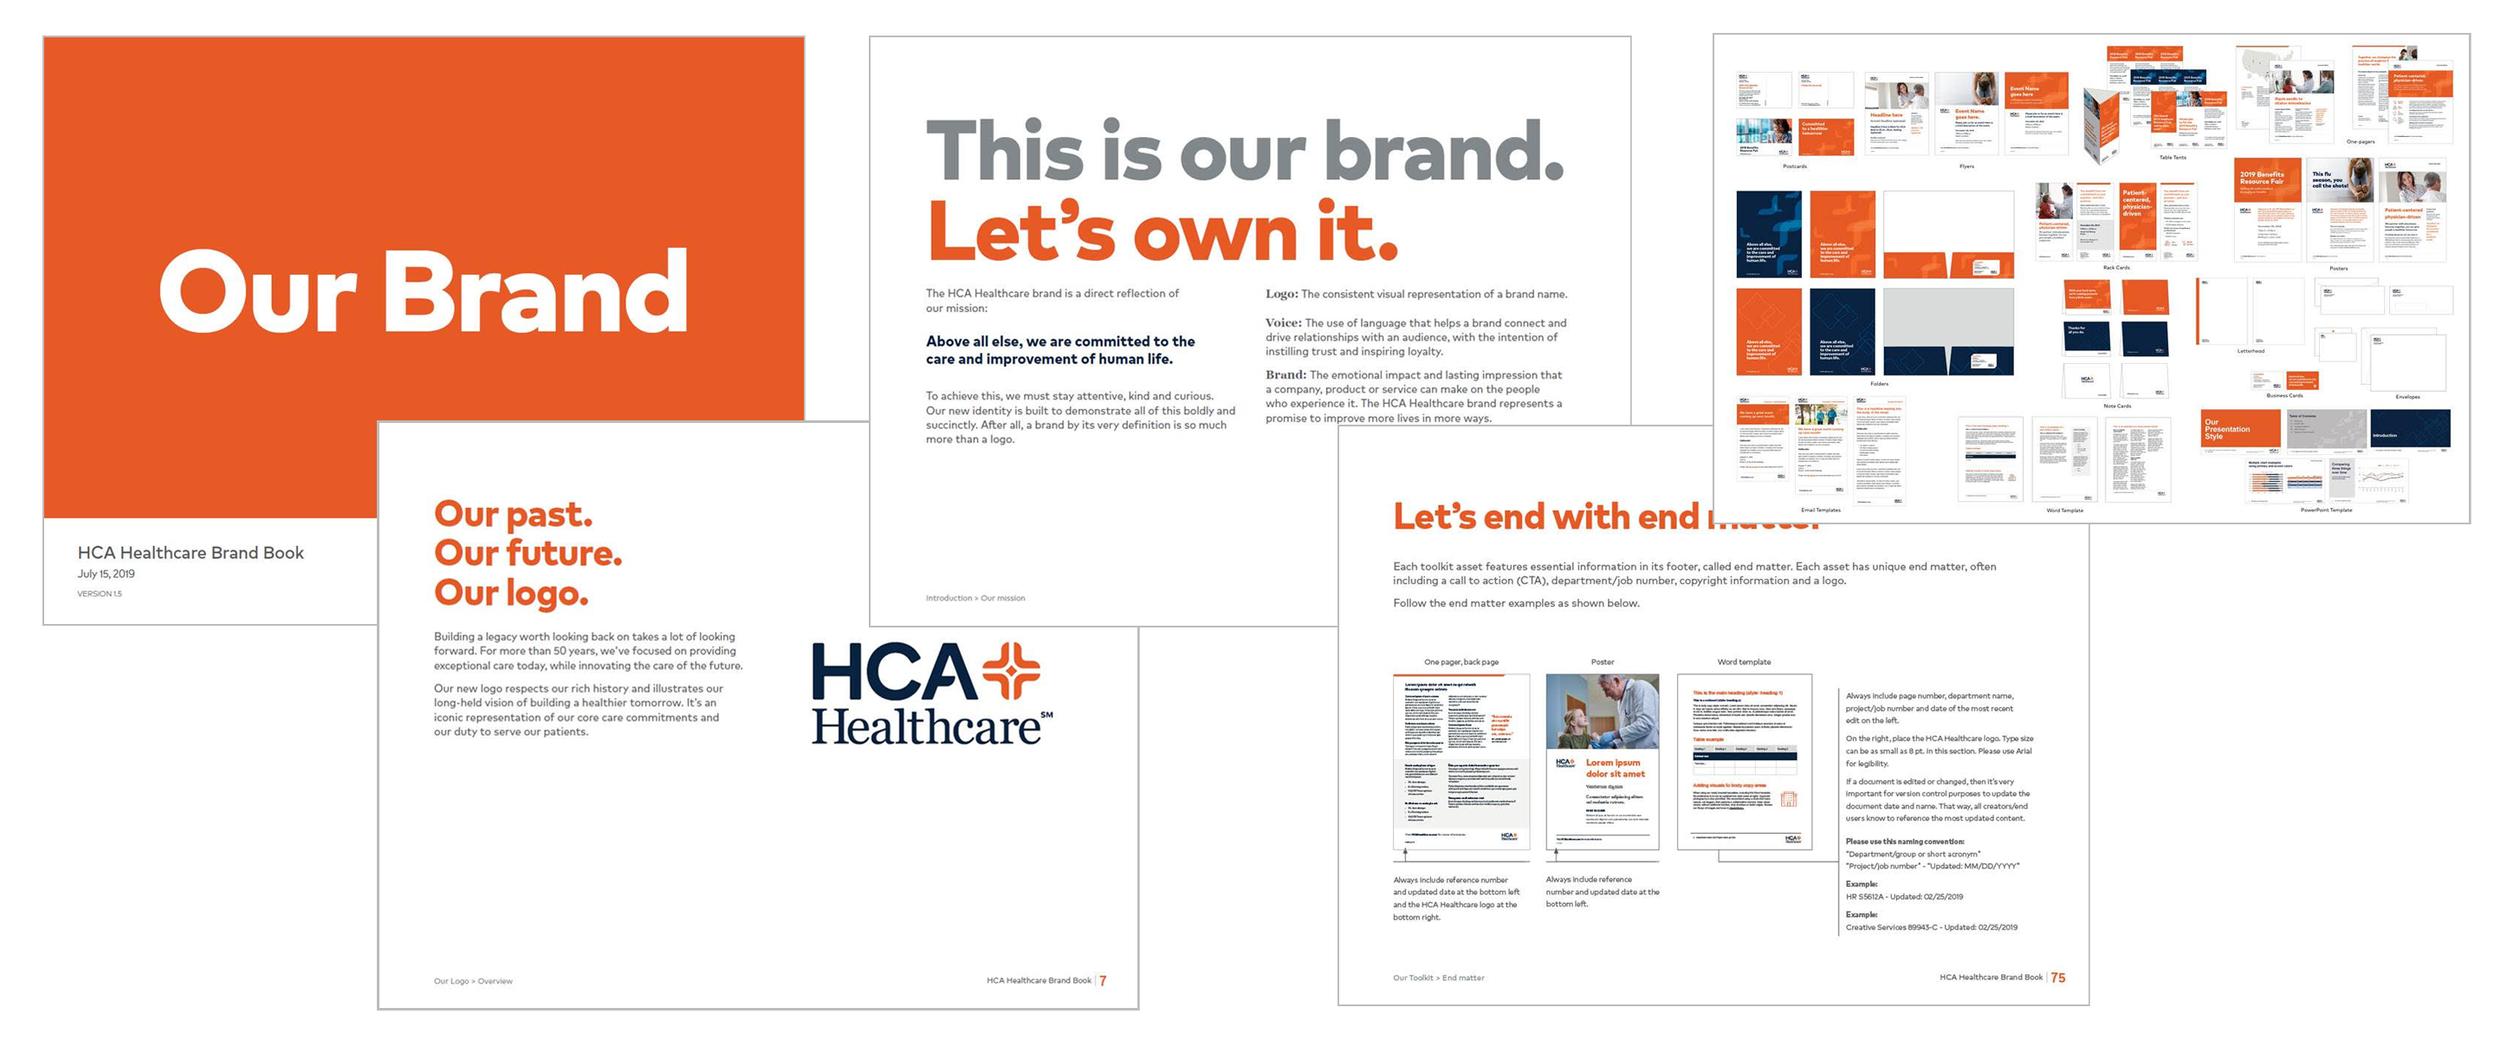 HCA_BrandGuidelines_1.png